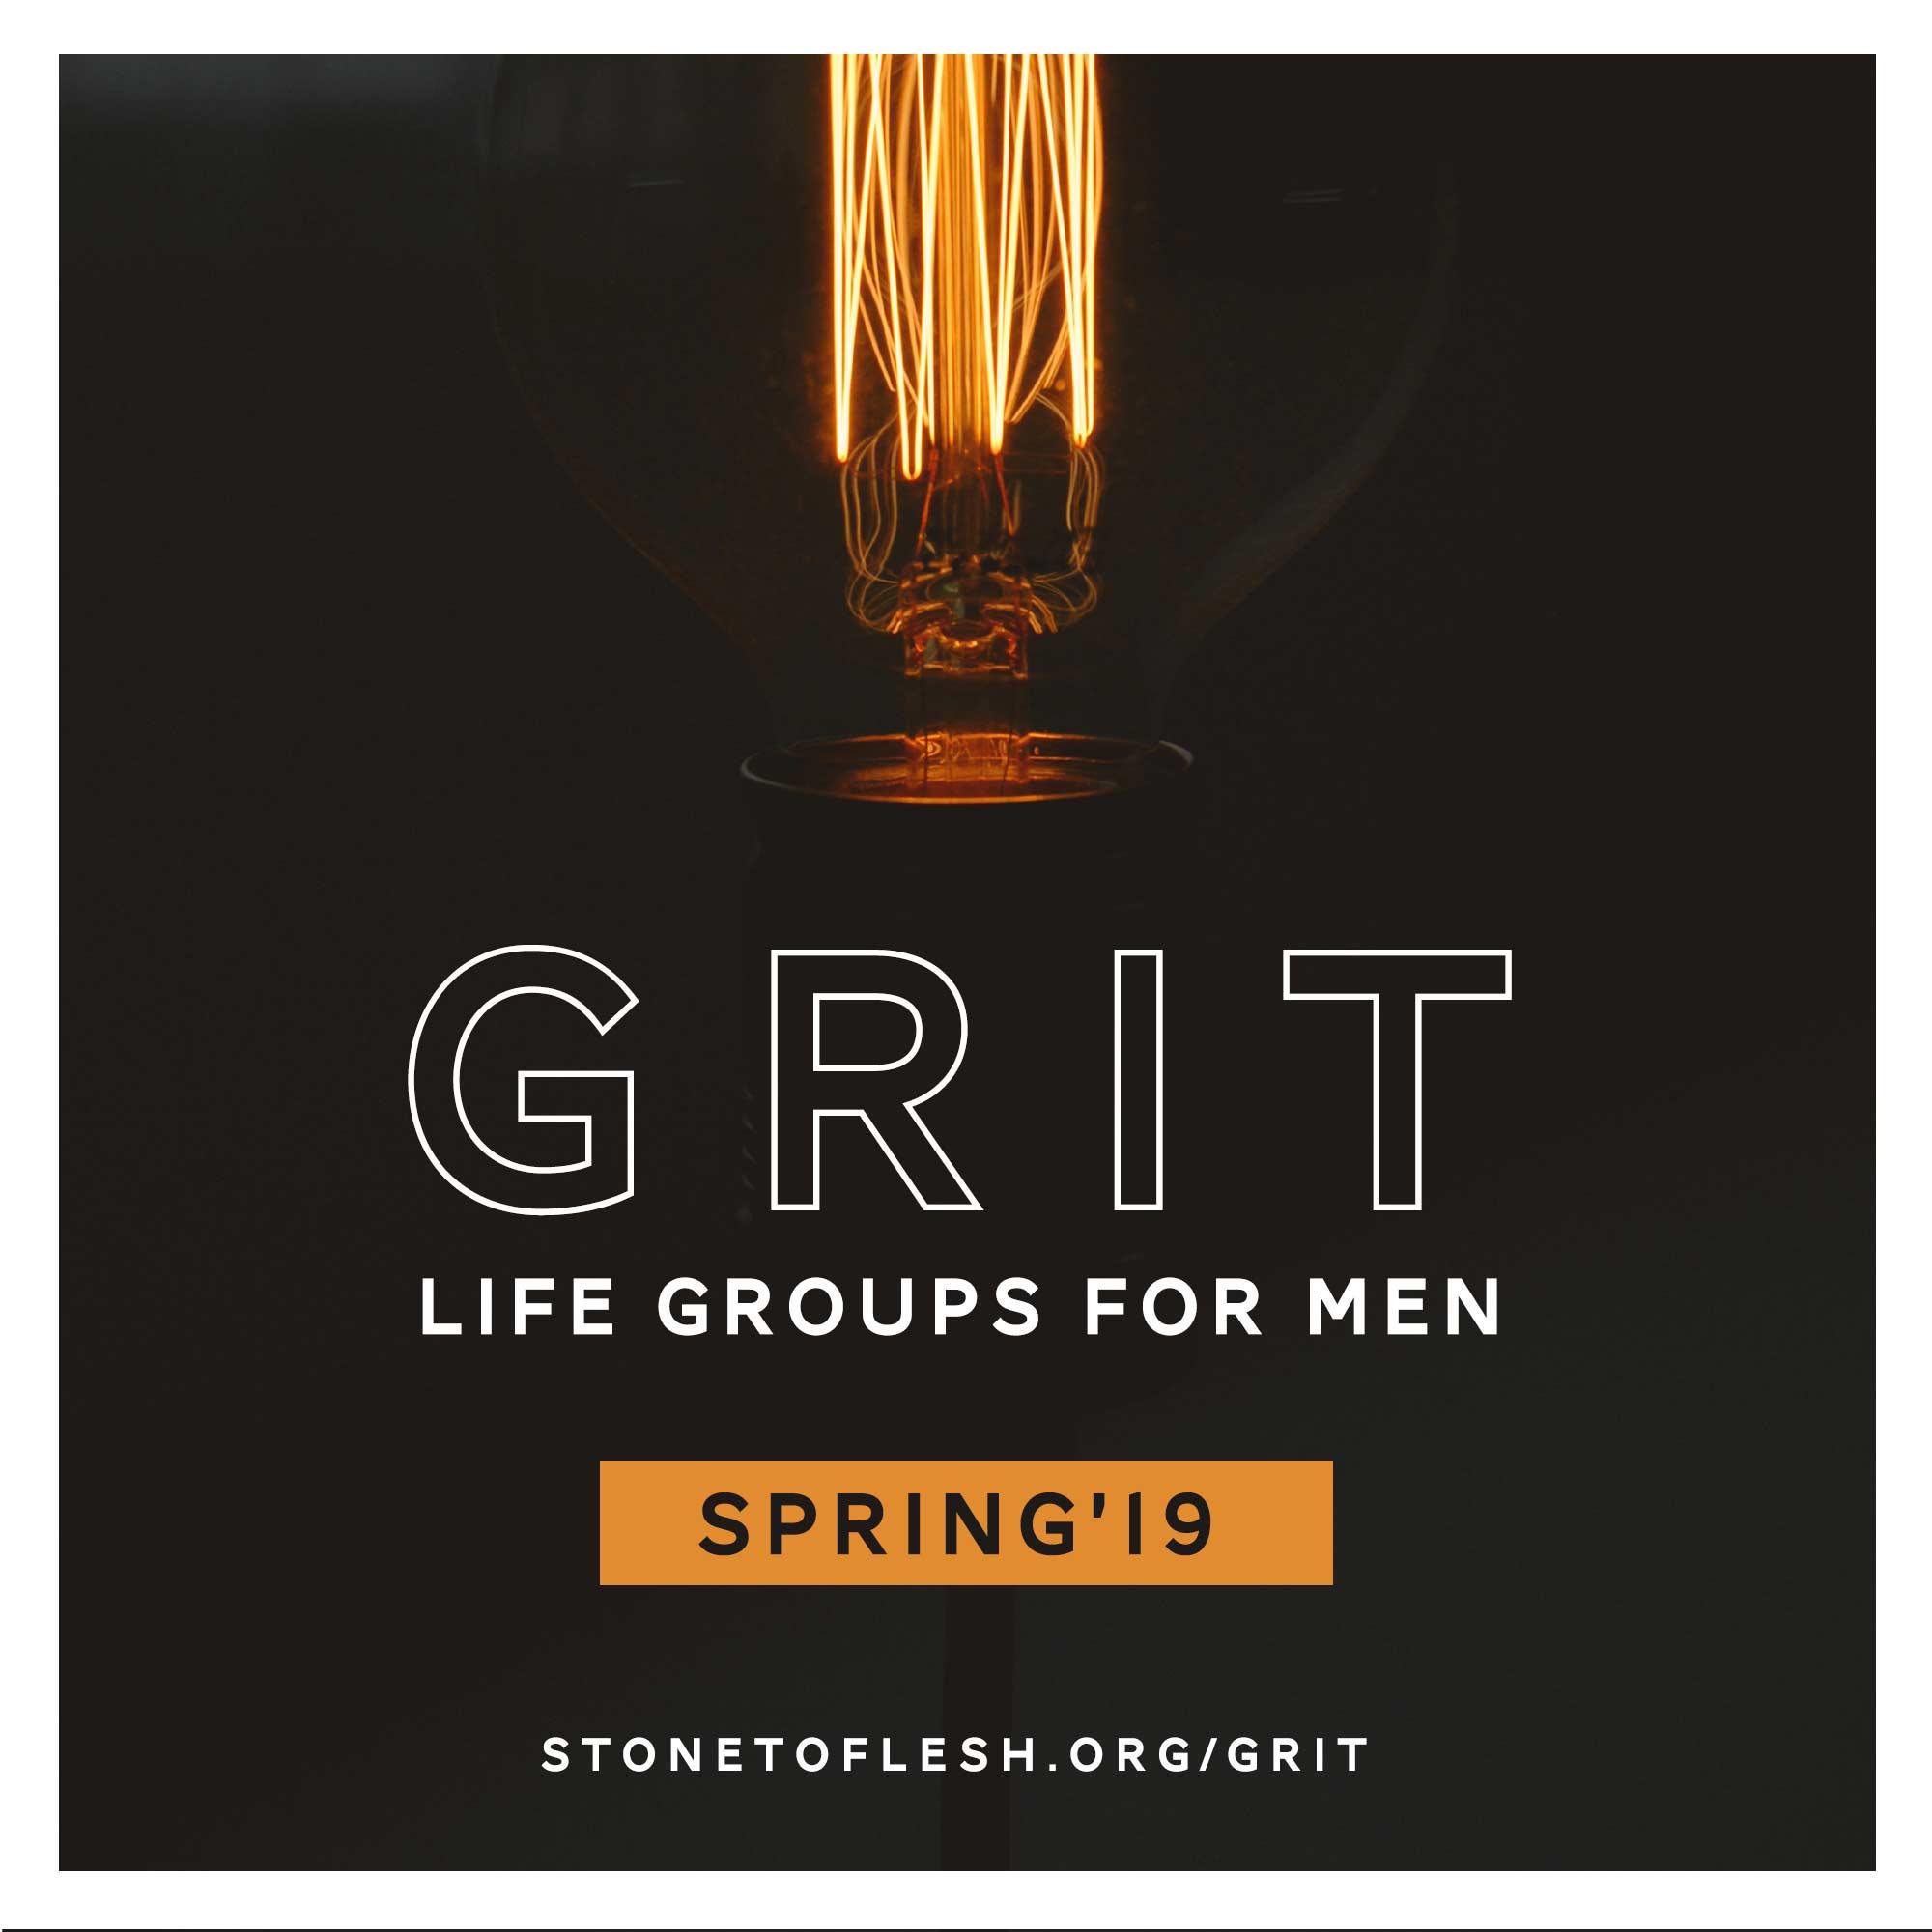 grit-spring'19.jpg